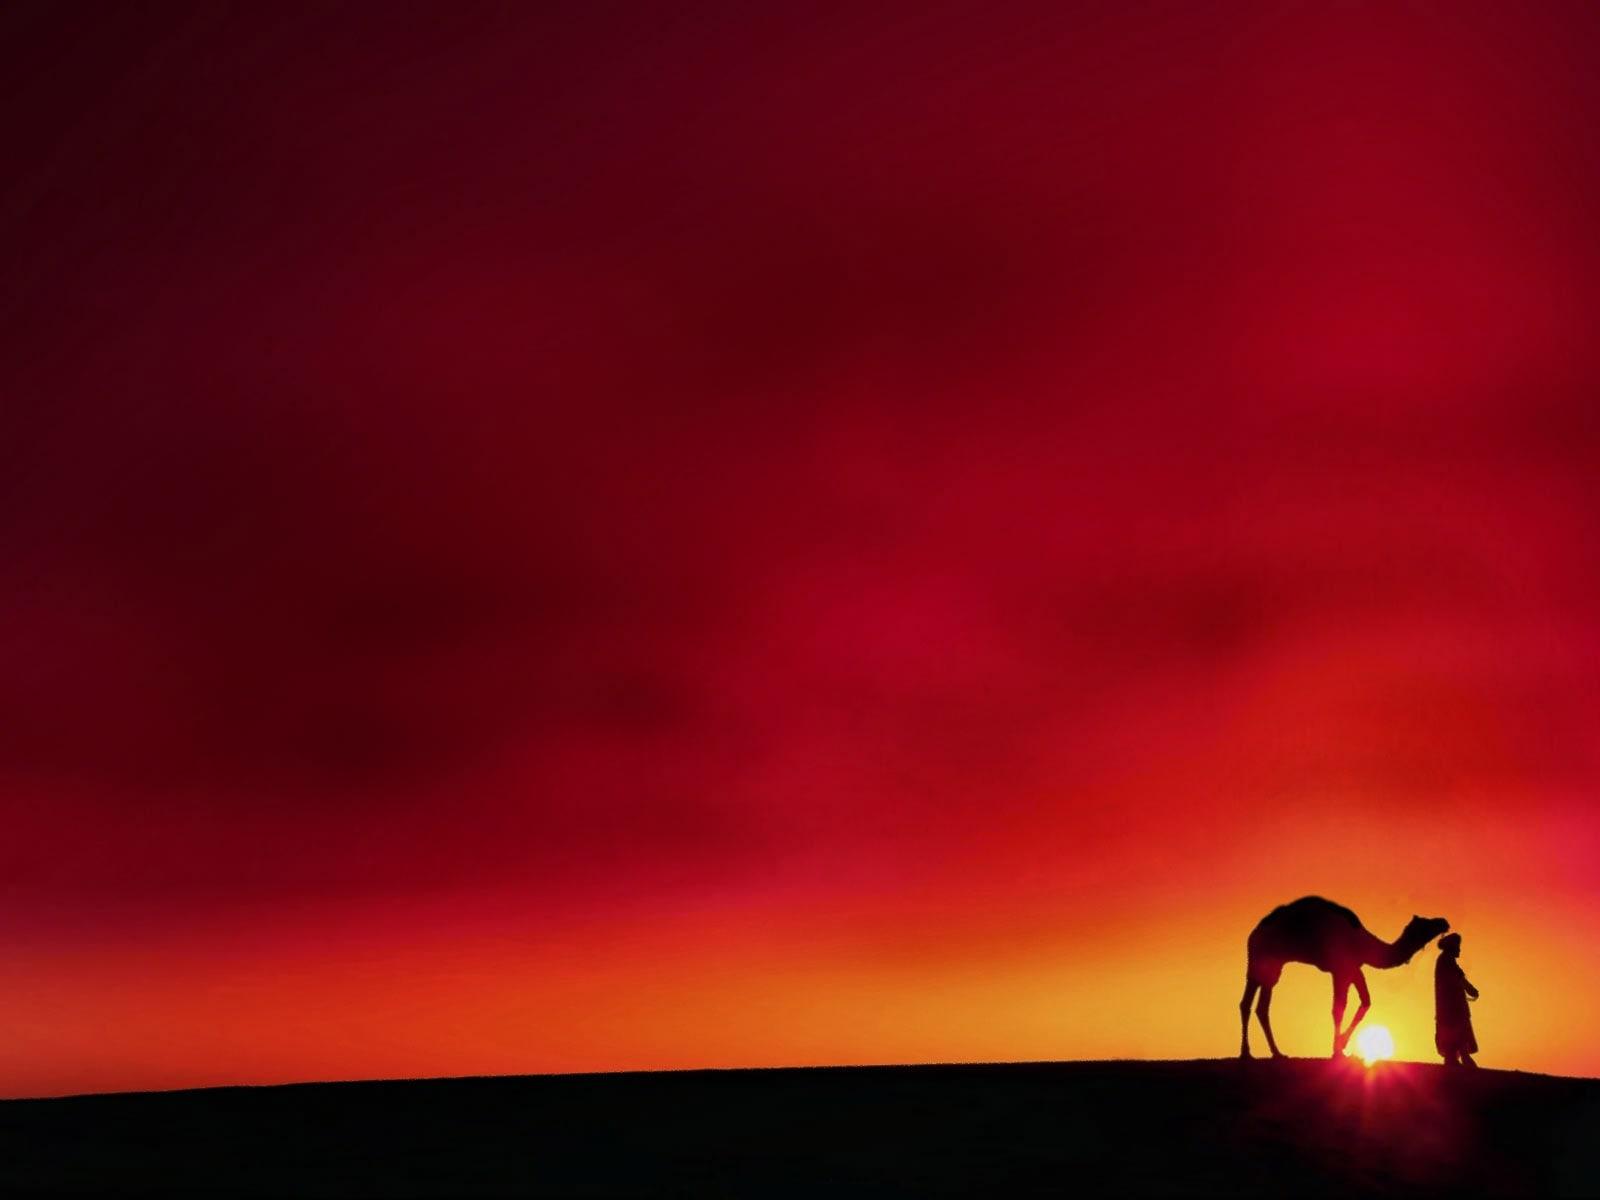 Camel Funny